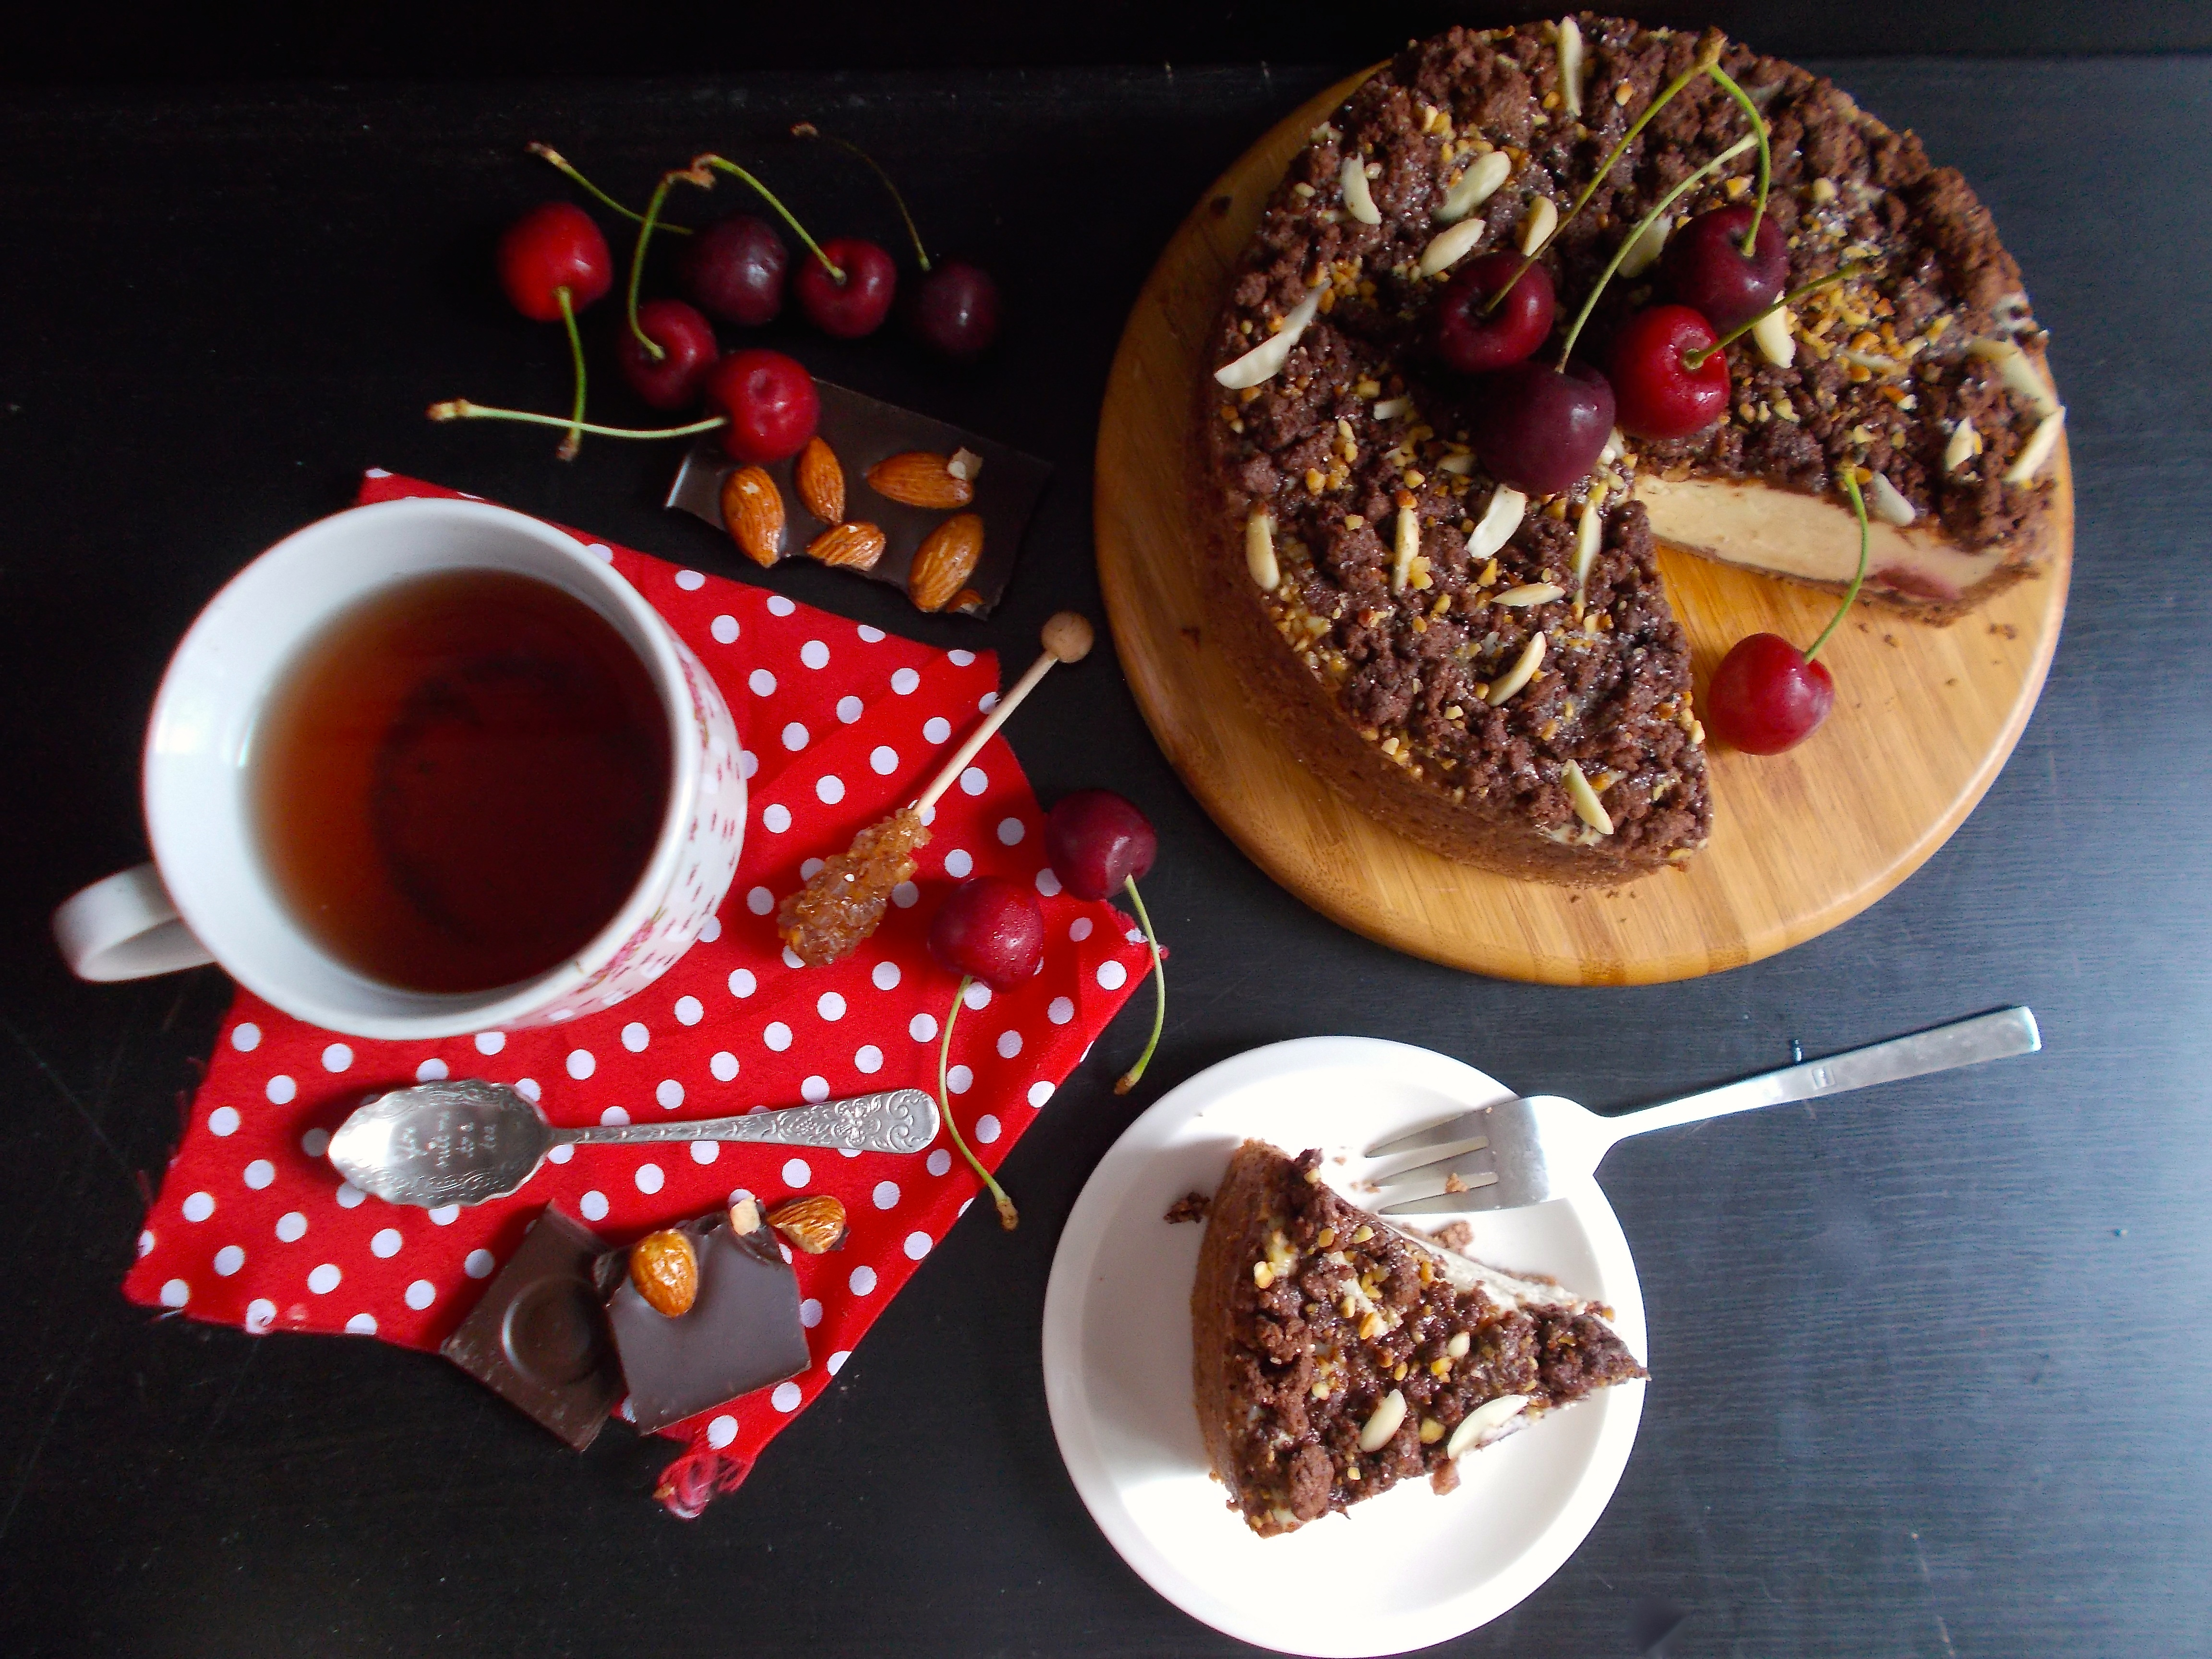 Käsekuchen façon forêt noire (cheesecake allemand) - Toque ...